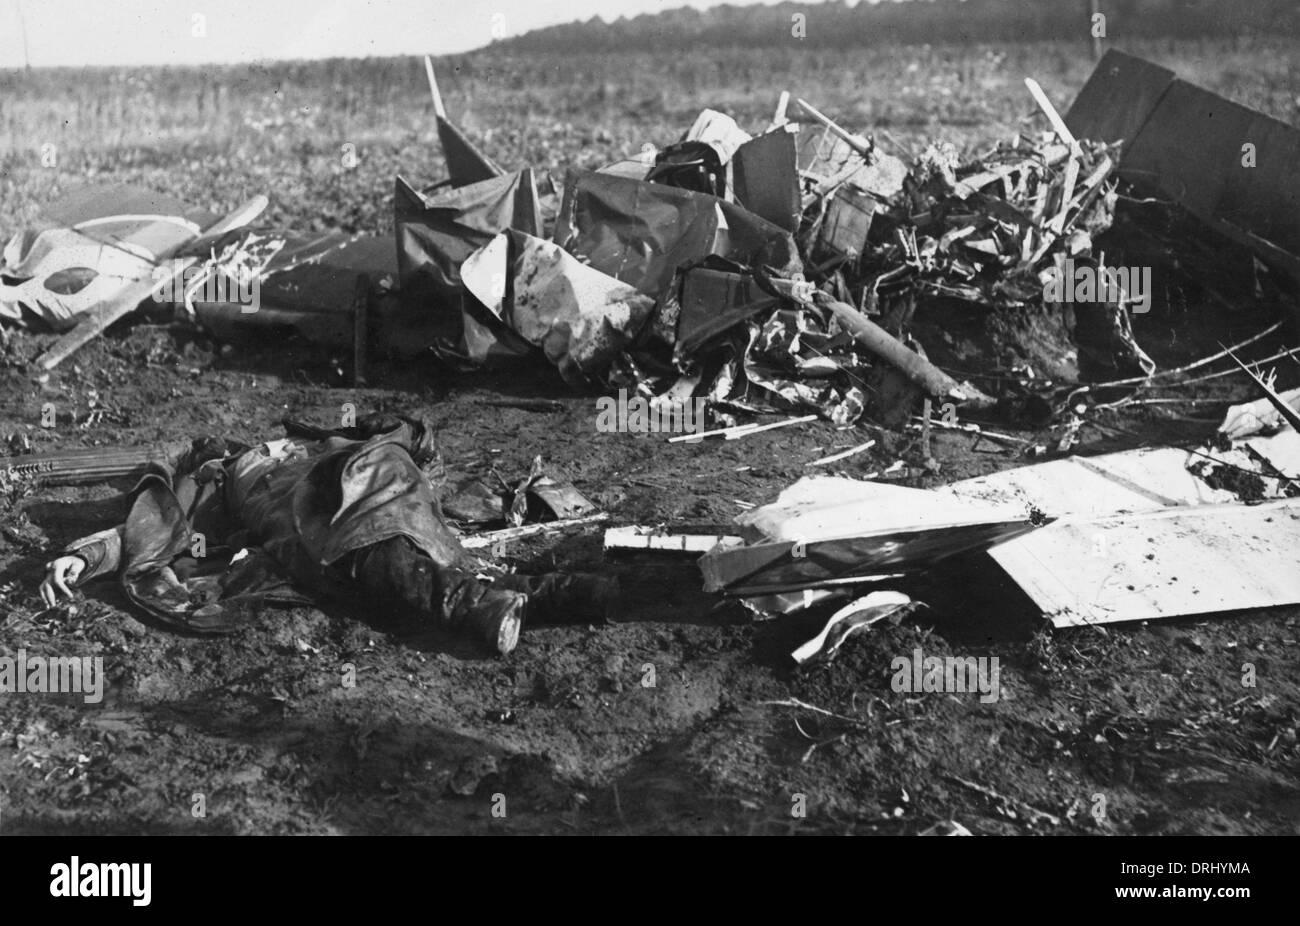 Airman Killed In Car Crash